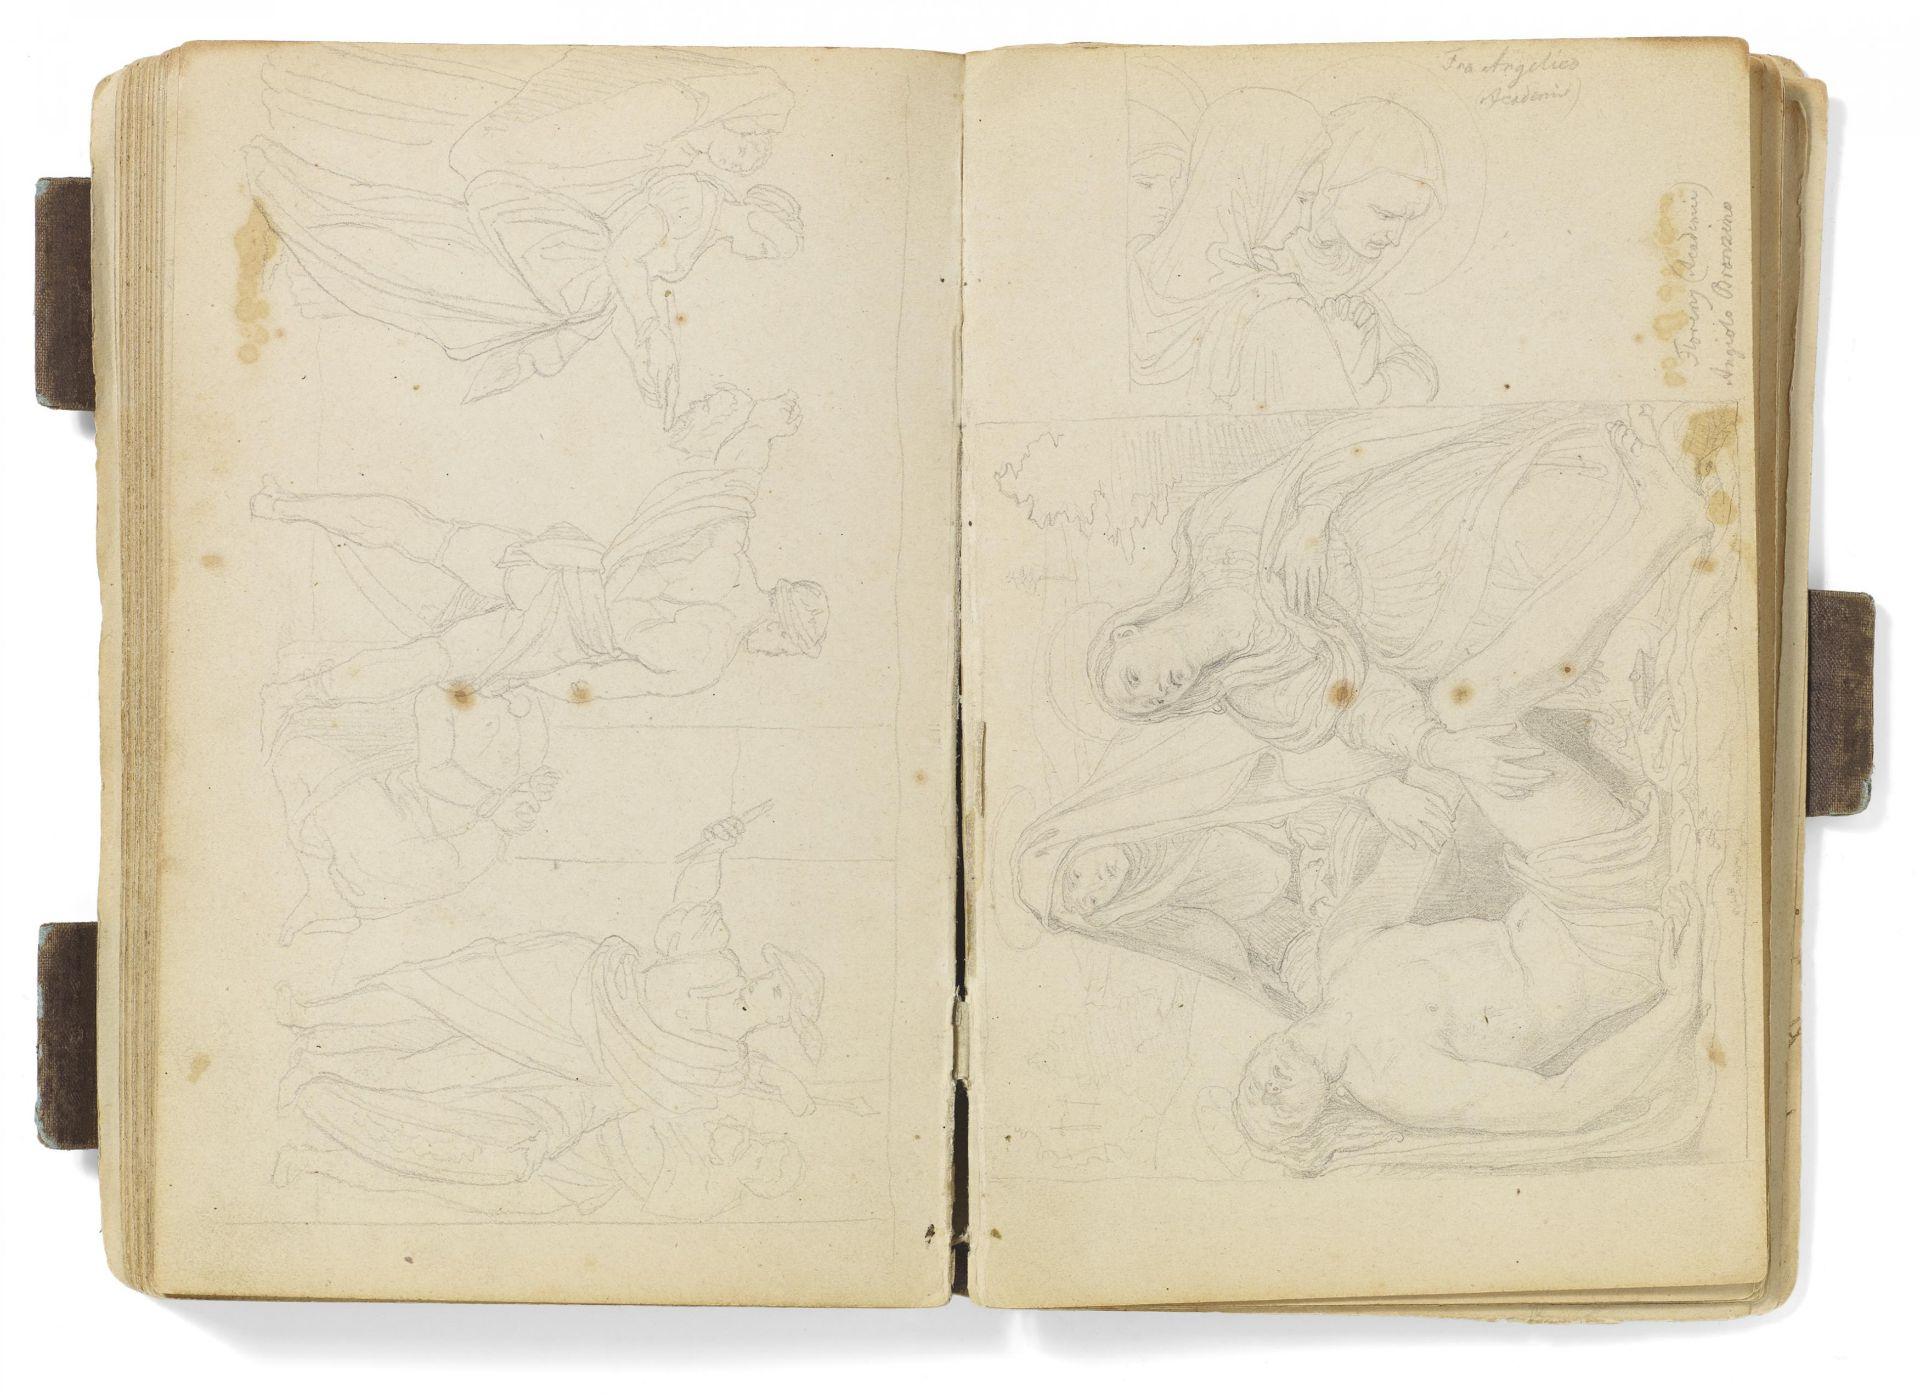 Kaupert, Gustav Kassel 1819 - 1897  Sketchbook, ca. 50 pages. Architecture, Italian landscapes - Bild 5 aus 6